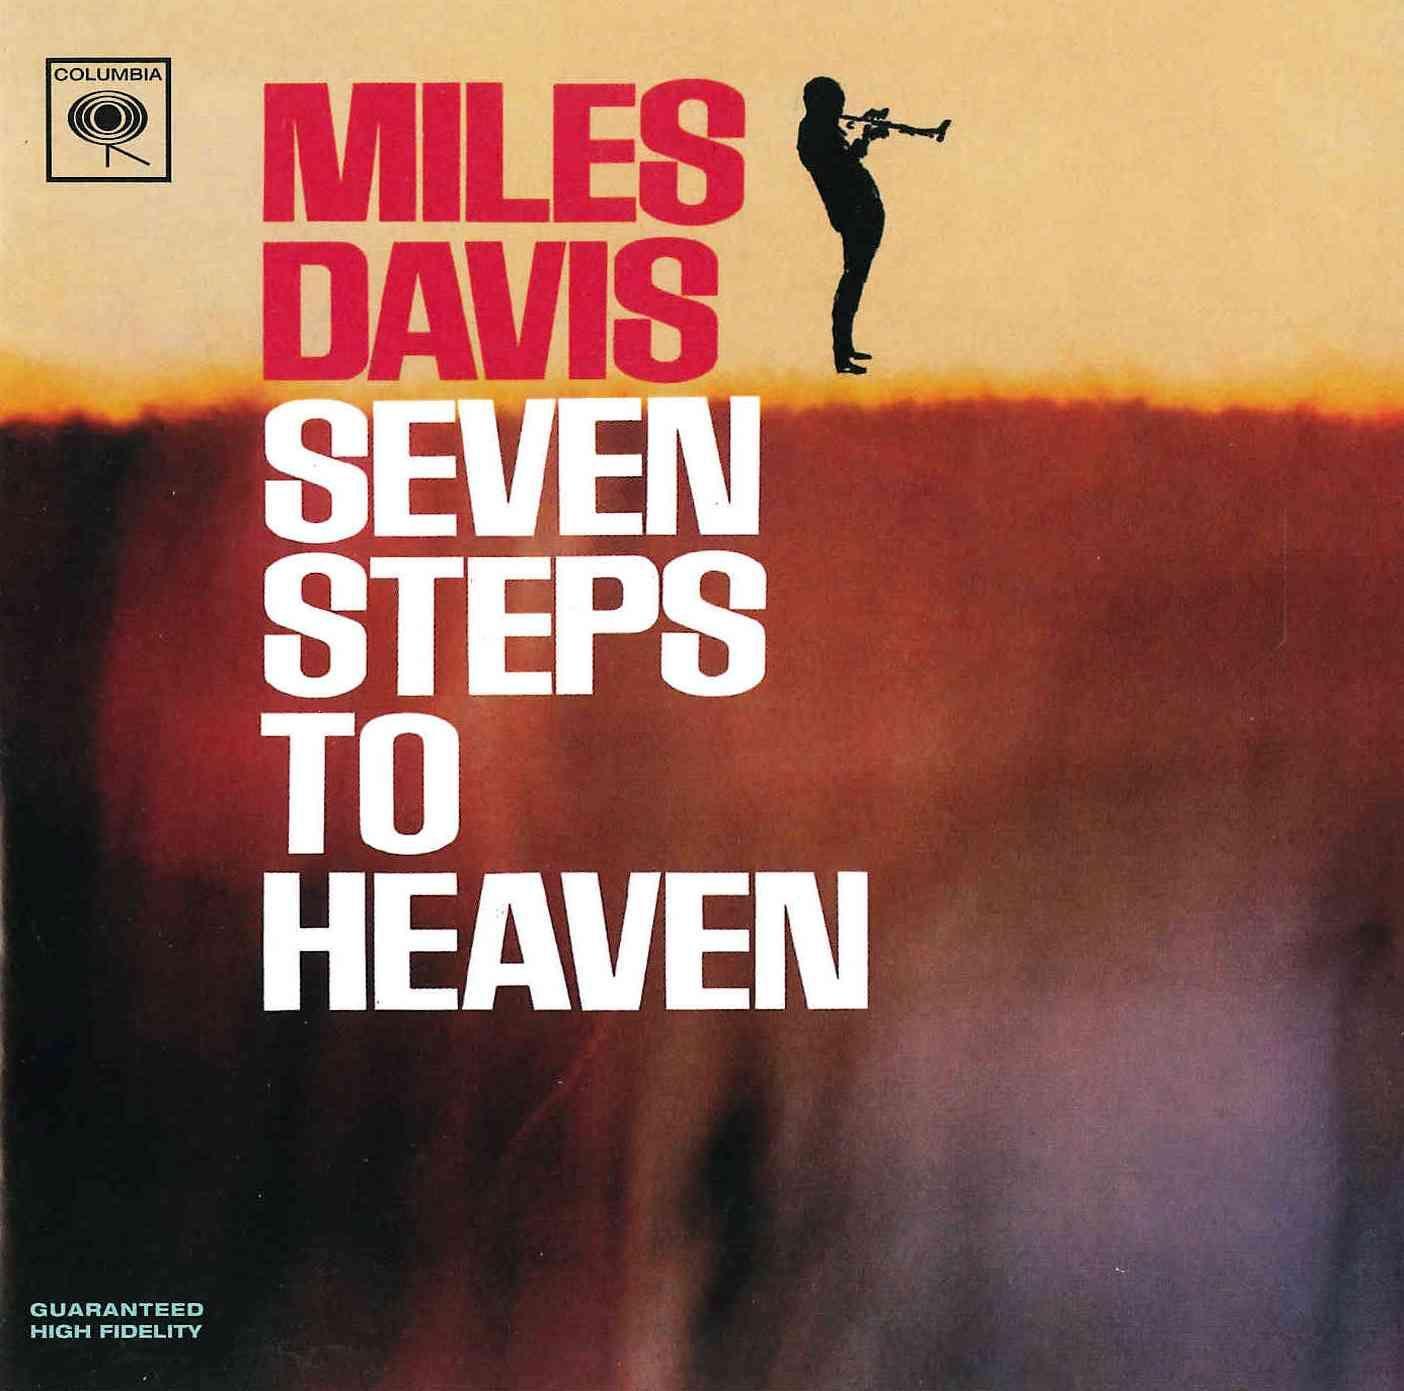 Miles davis seven steps to heaven